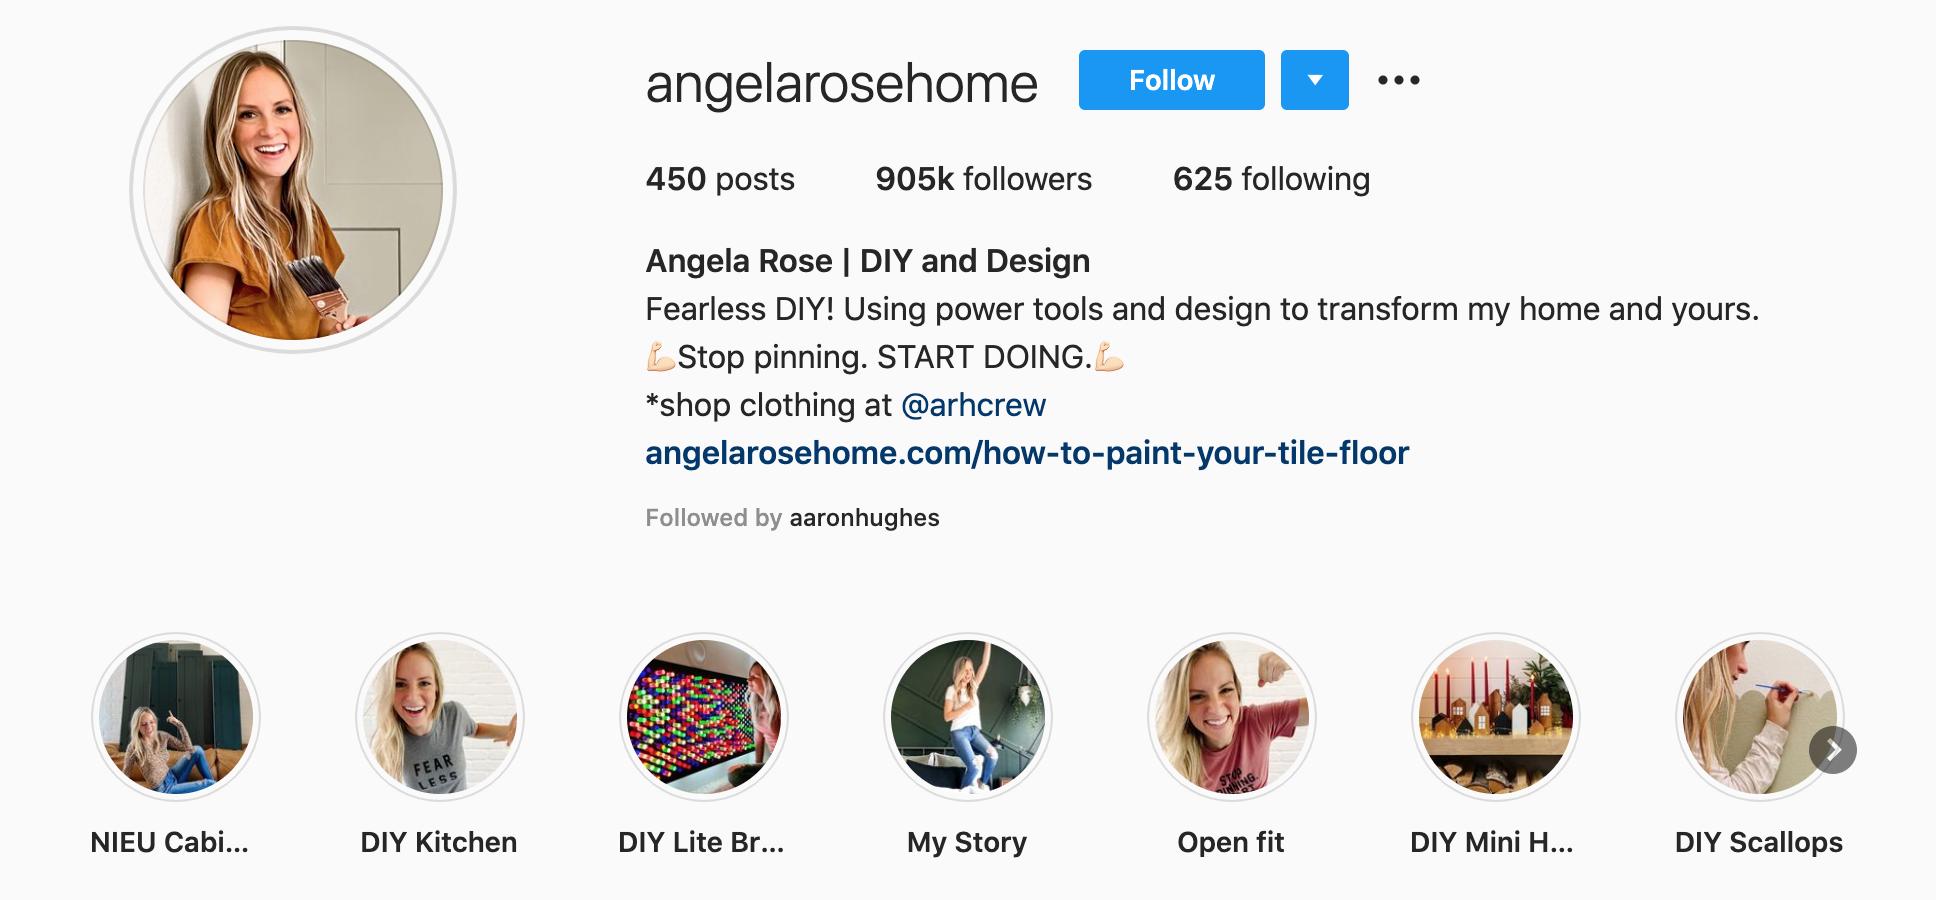 angela-rose-instagram-profile-alegalrosehome